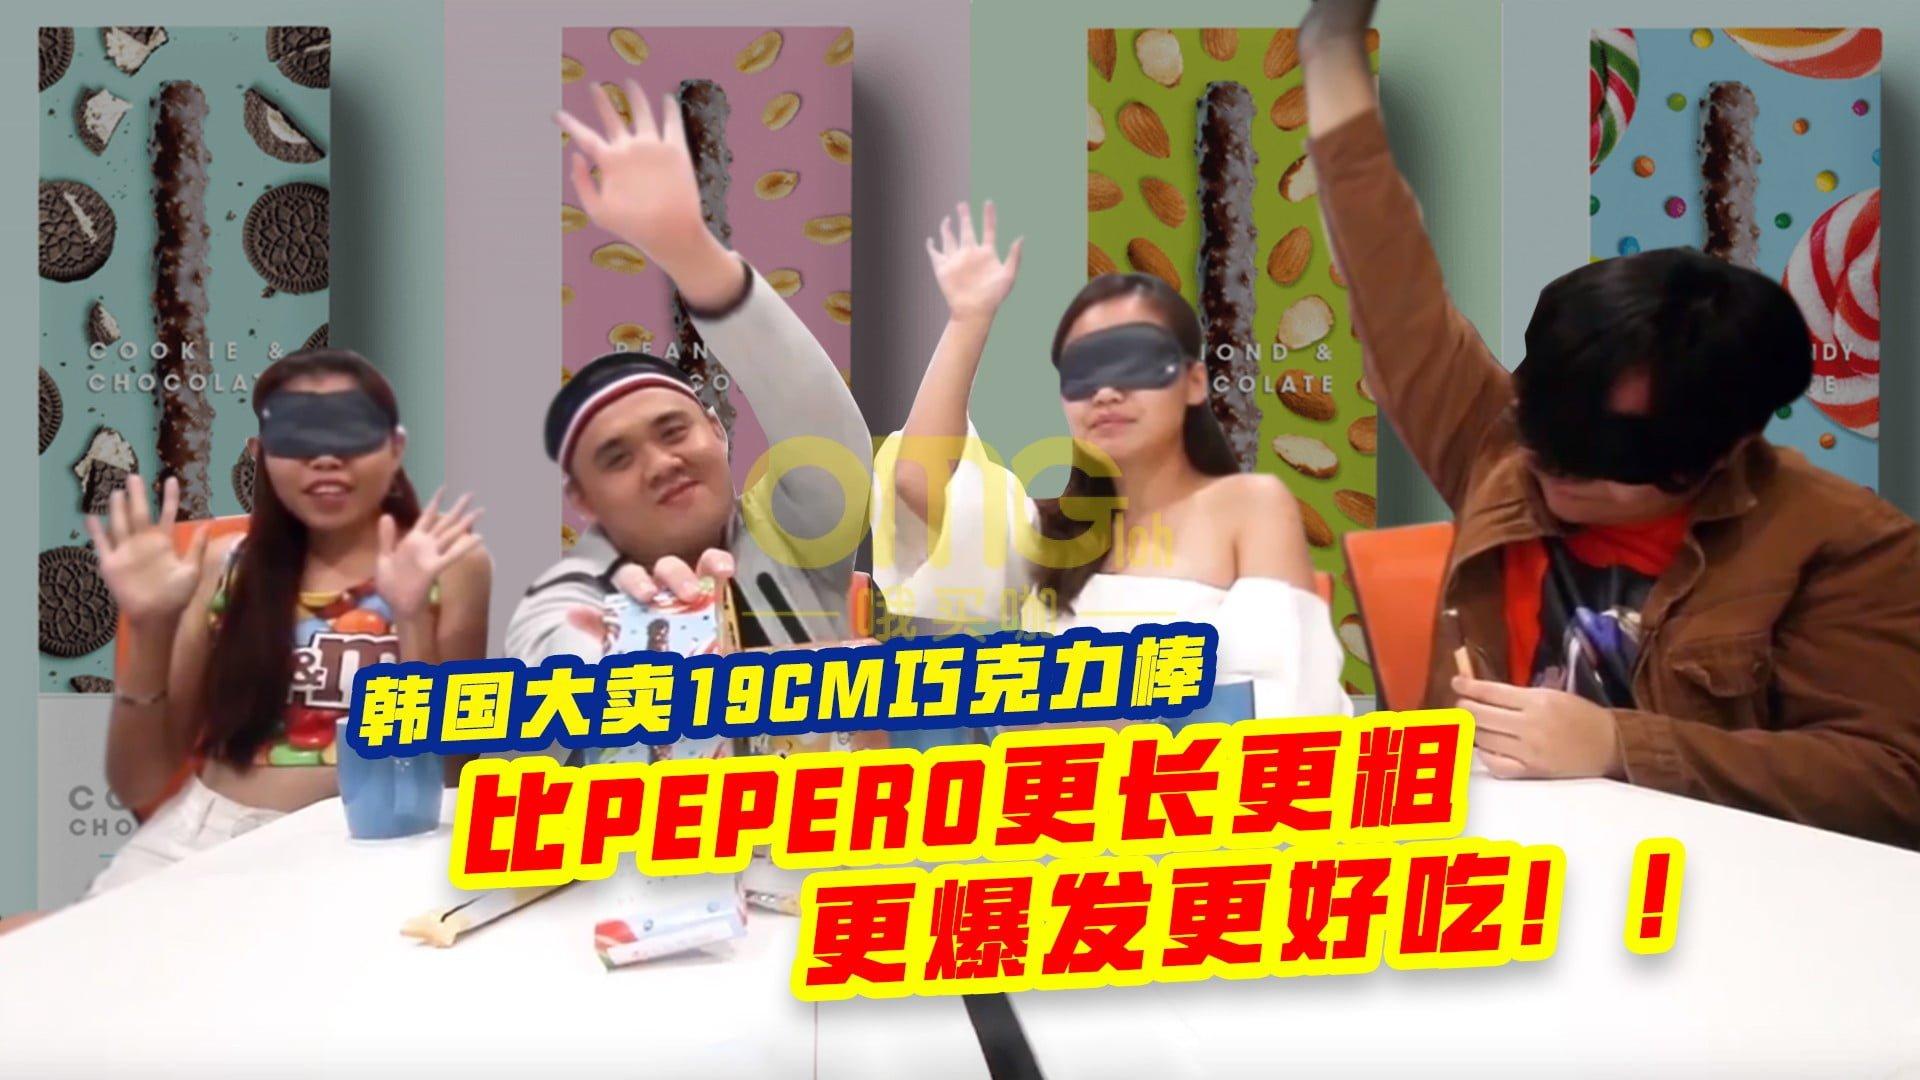 choco banner at omgloh.com